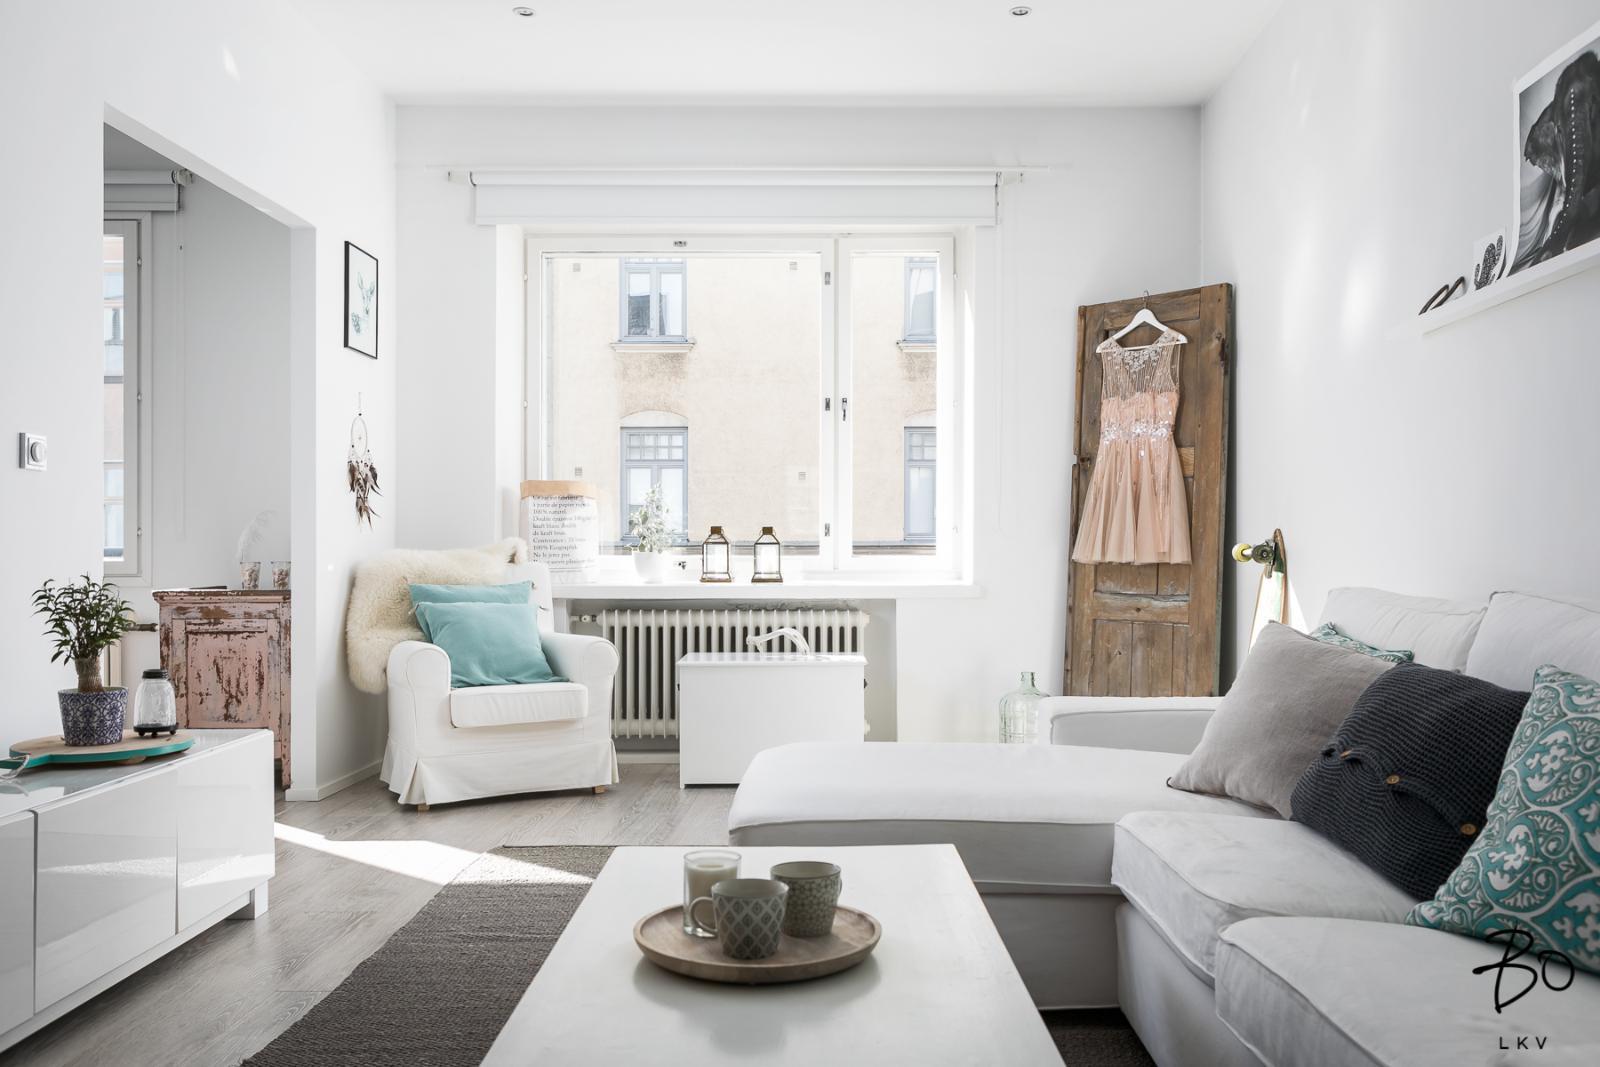 Kaksion kaunis olohuone - Etuovi.com Ideat & vinkit